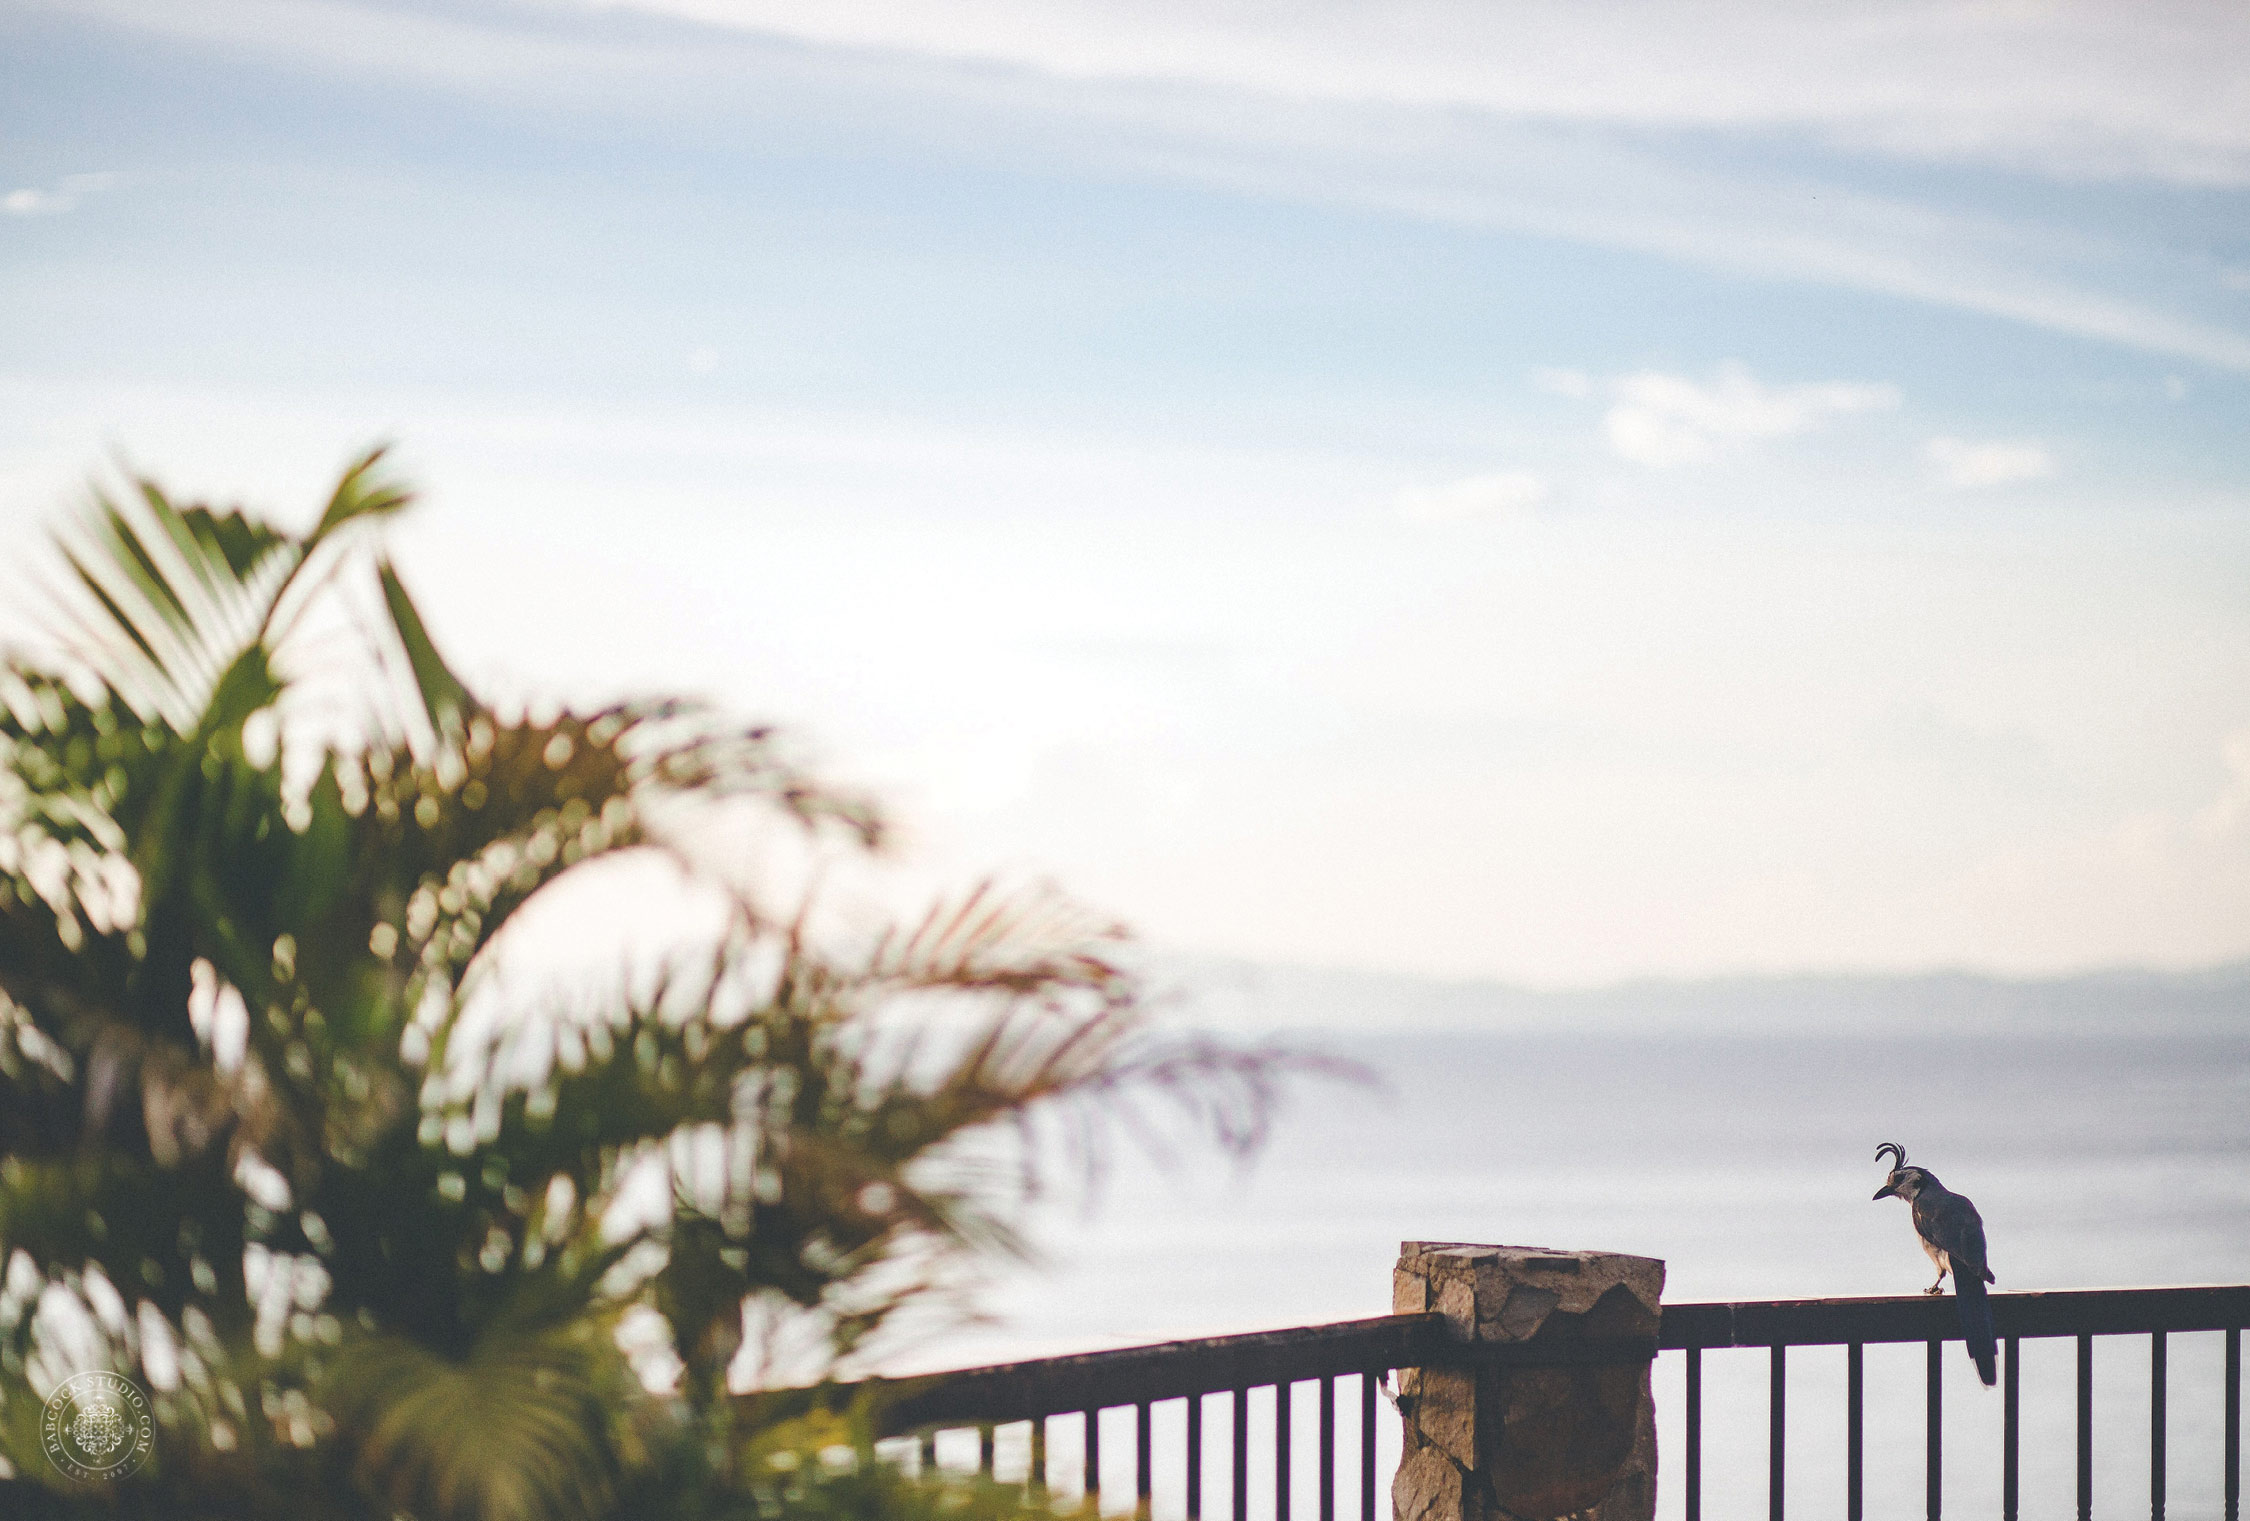 2cat-brandon-costa-rica-destination-wedding-photographer-dayton-ohio-2.jpg